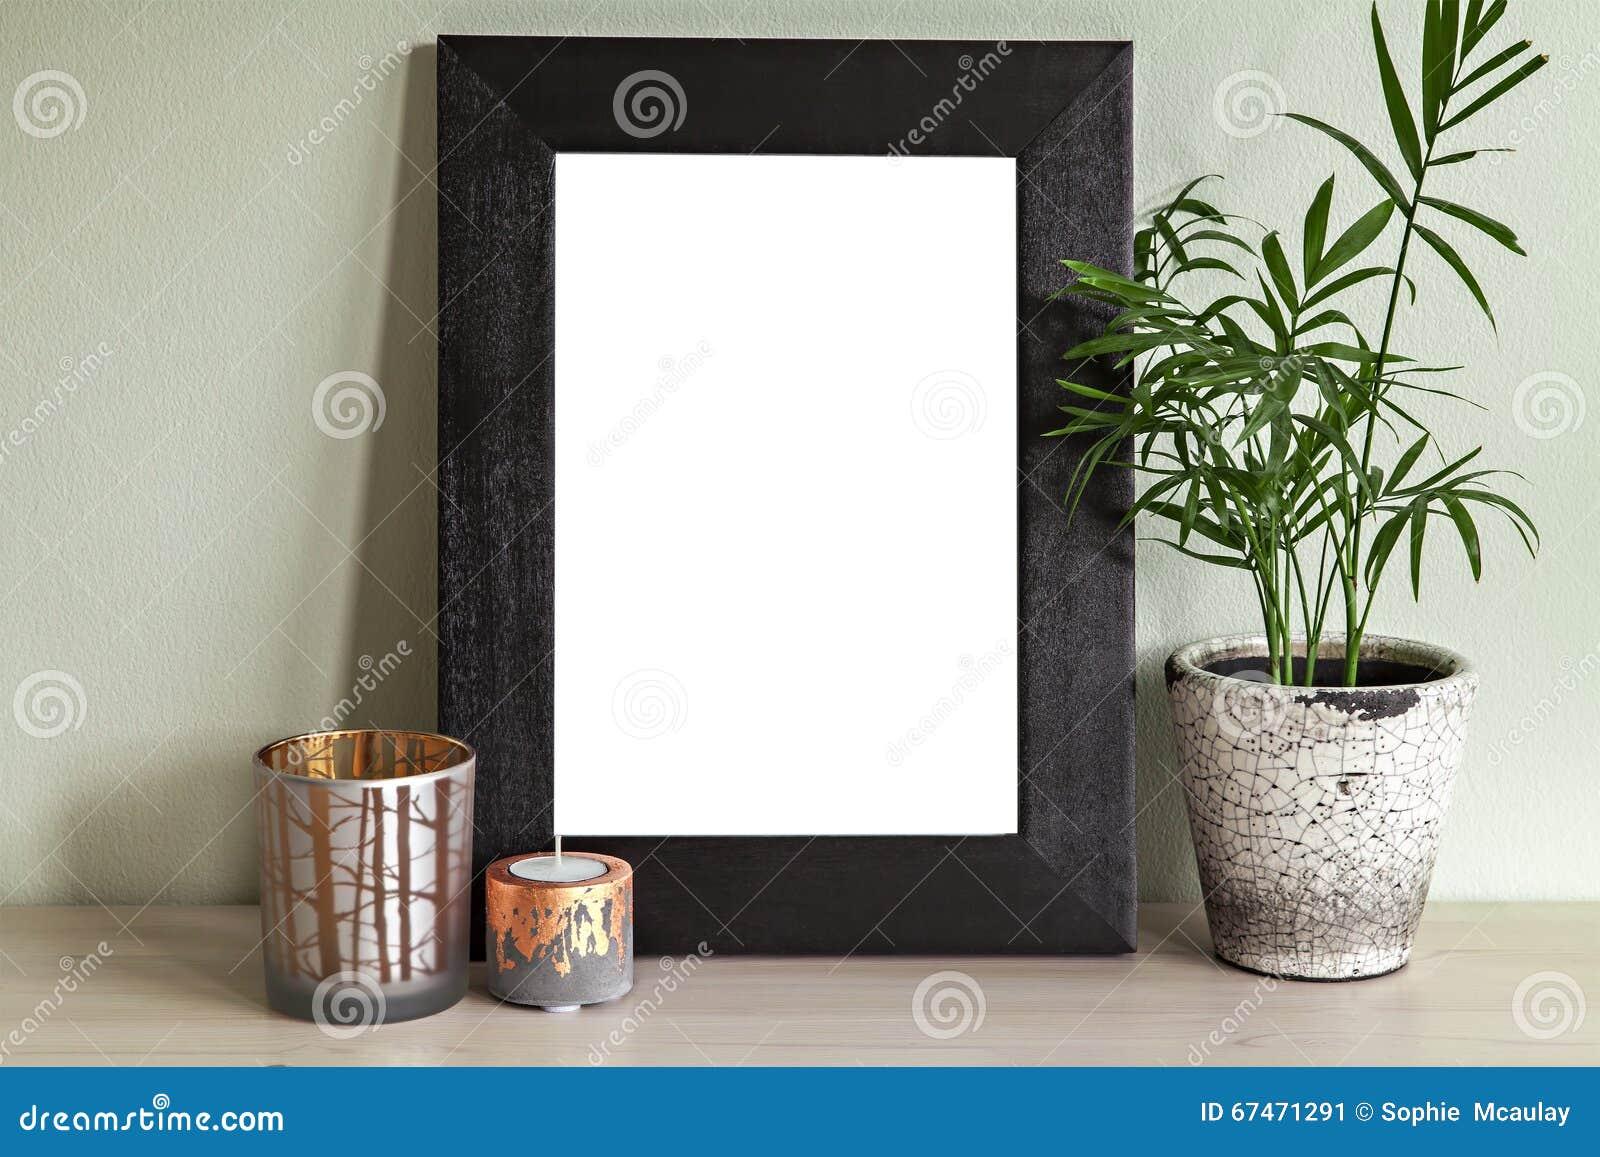 Standing Frame Mock Up Scene Stock Image - Image of lifestyle, desk ...